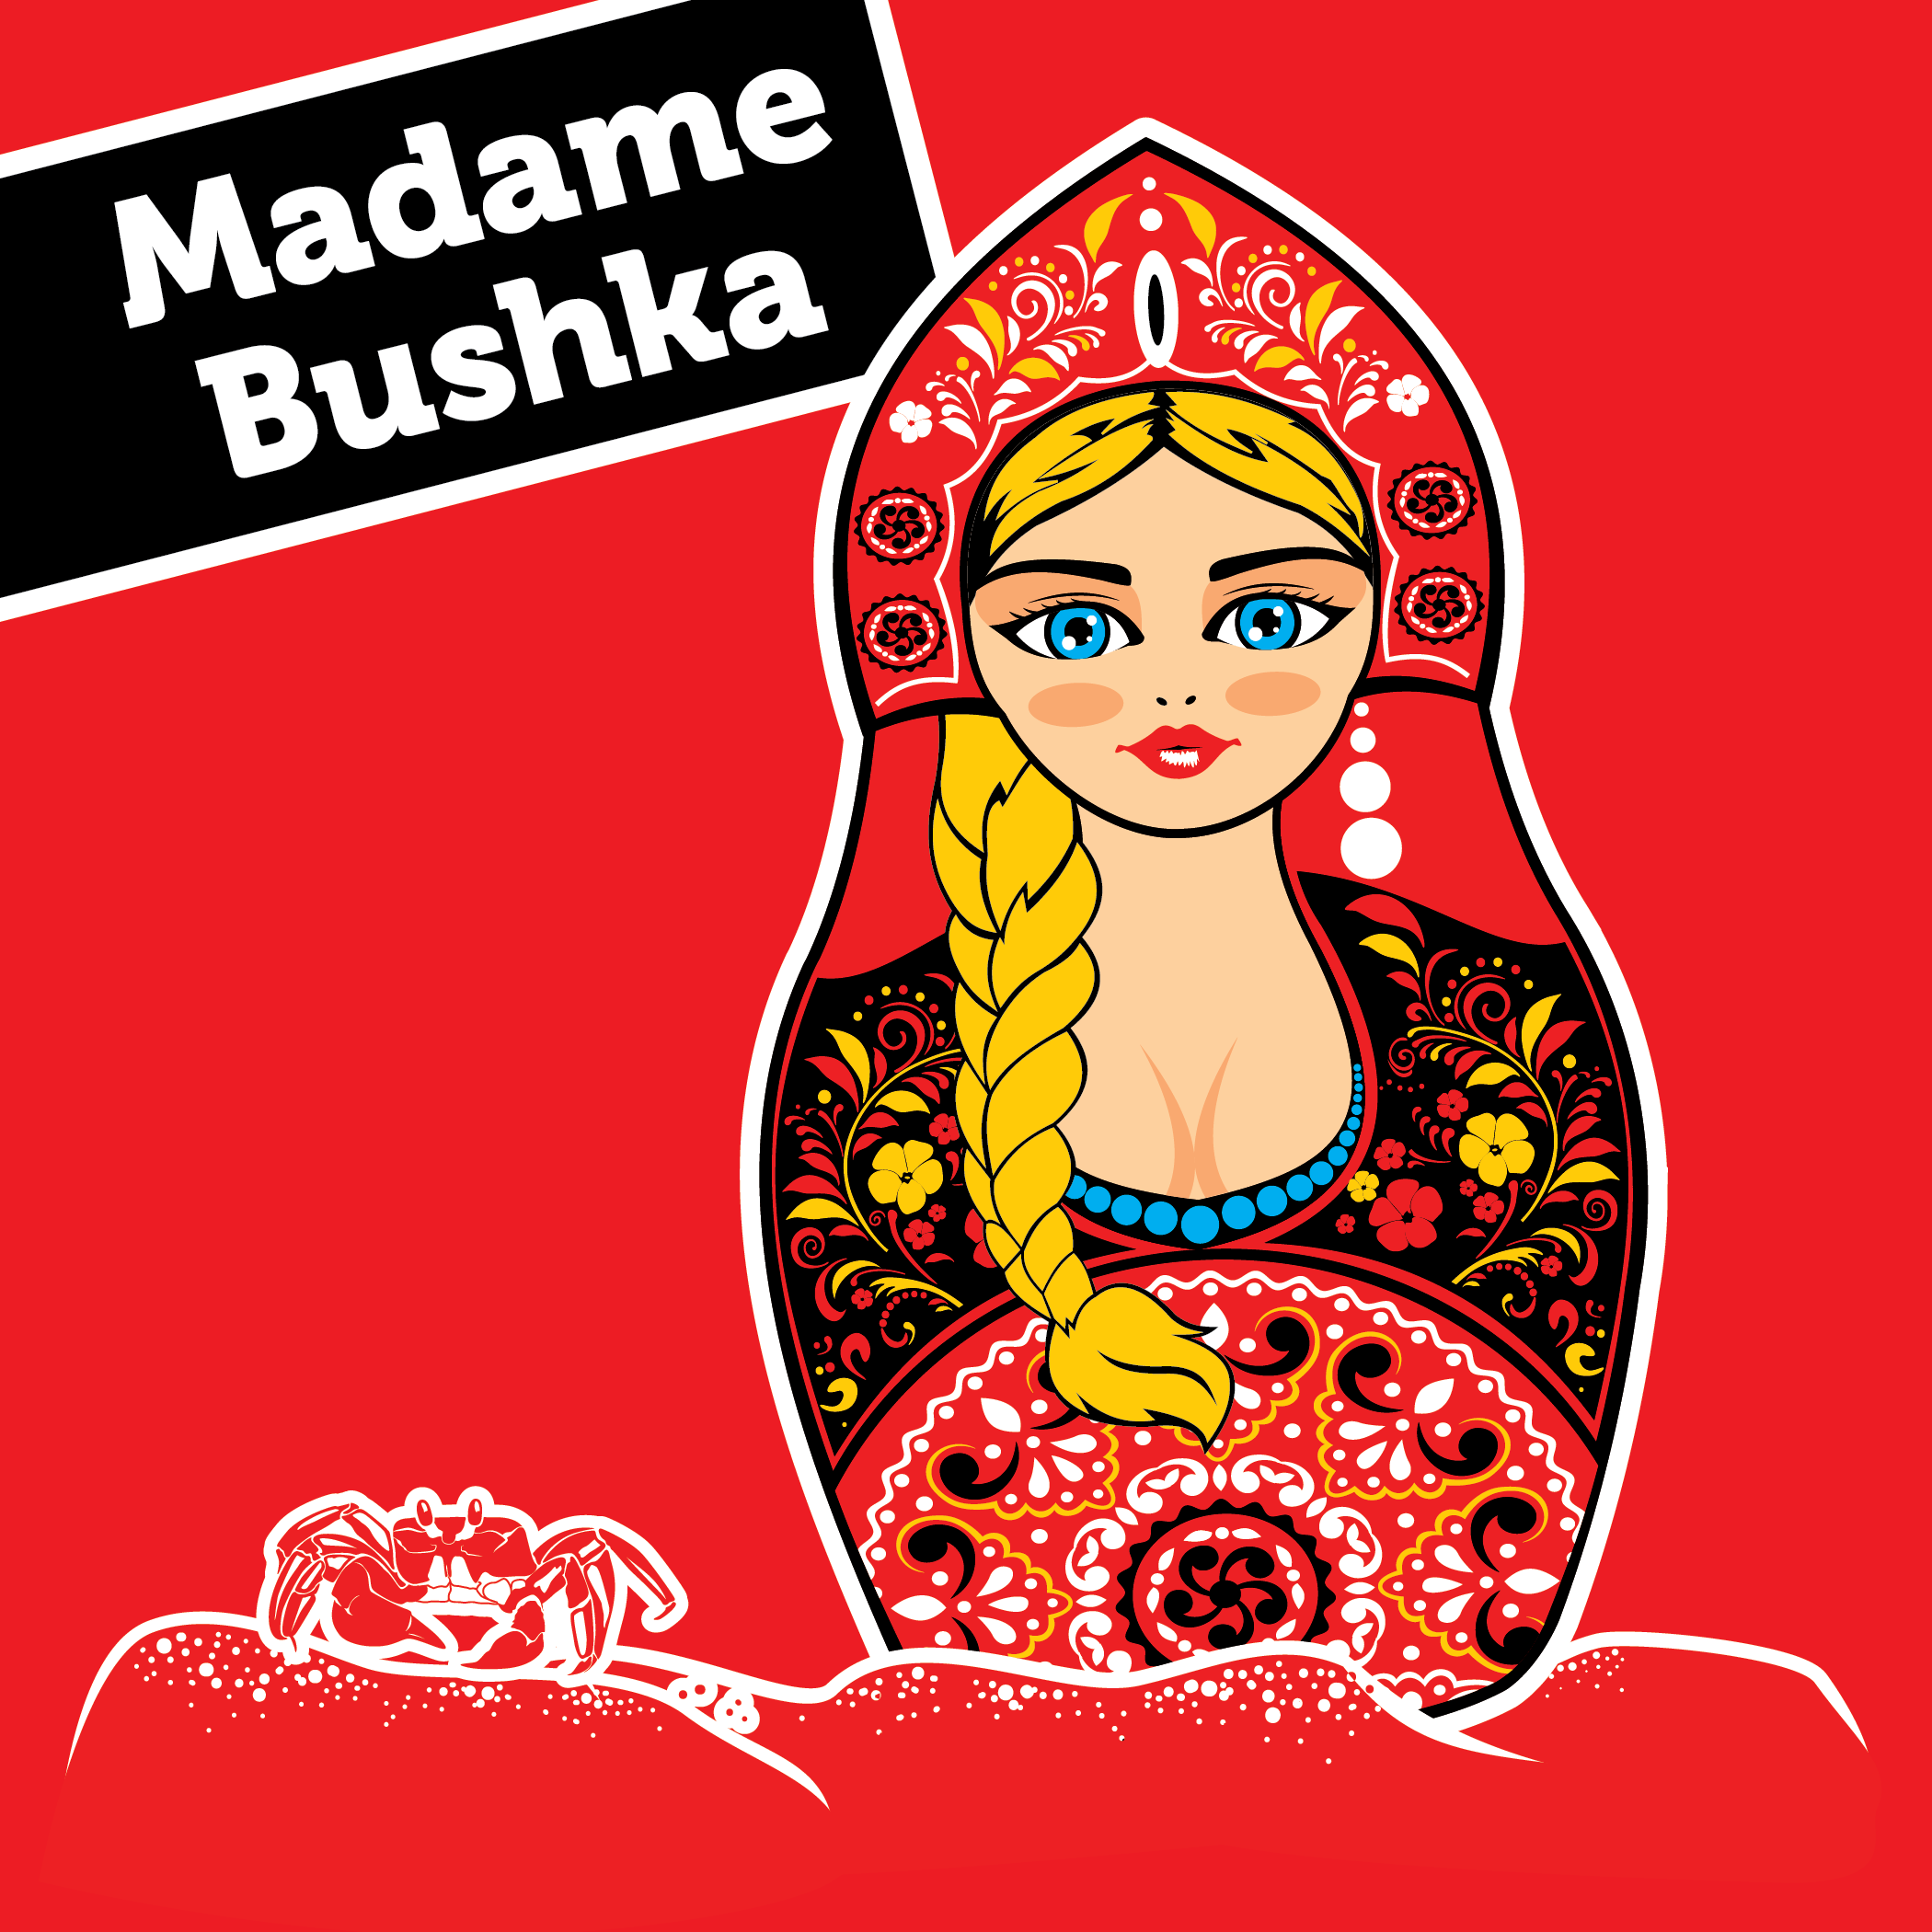 Madame Bushka